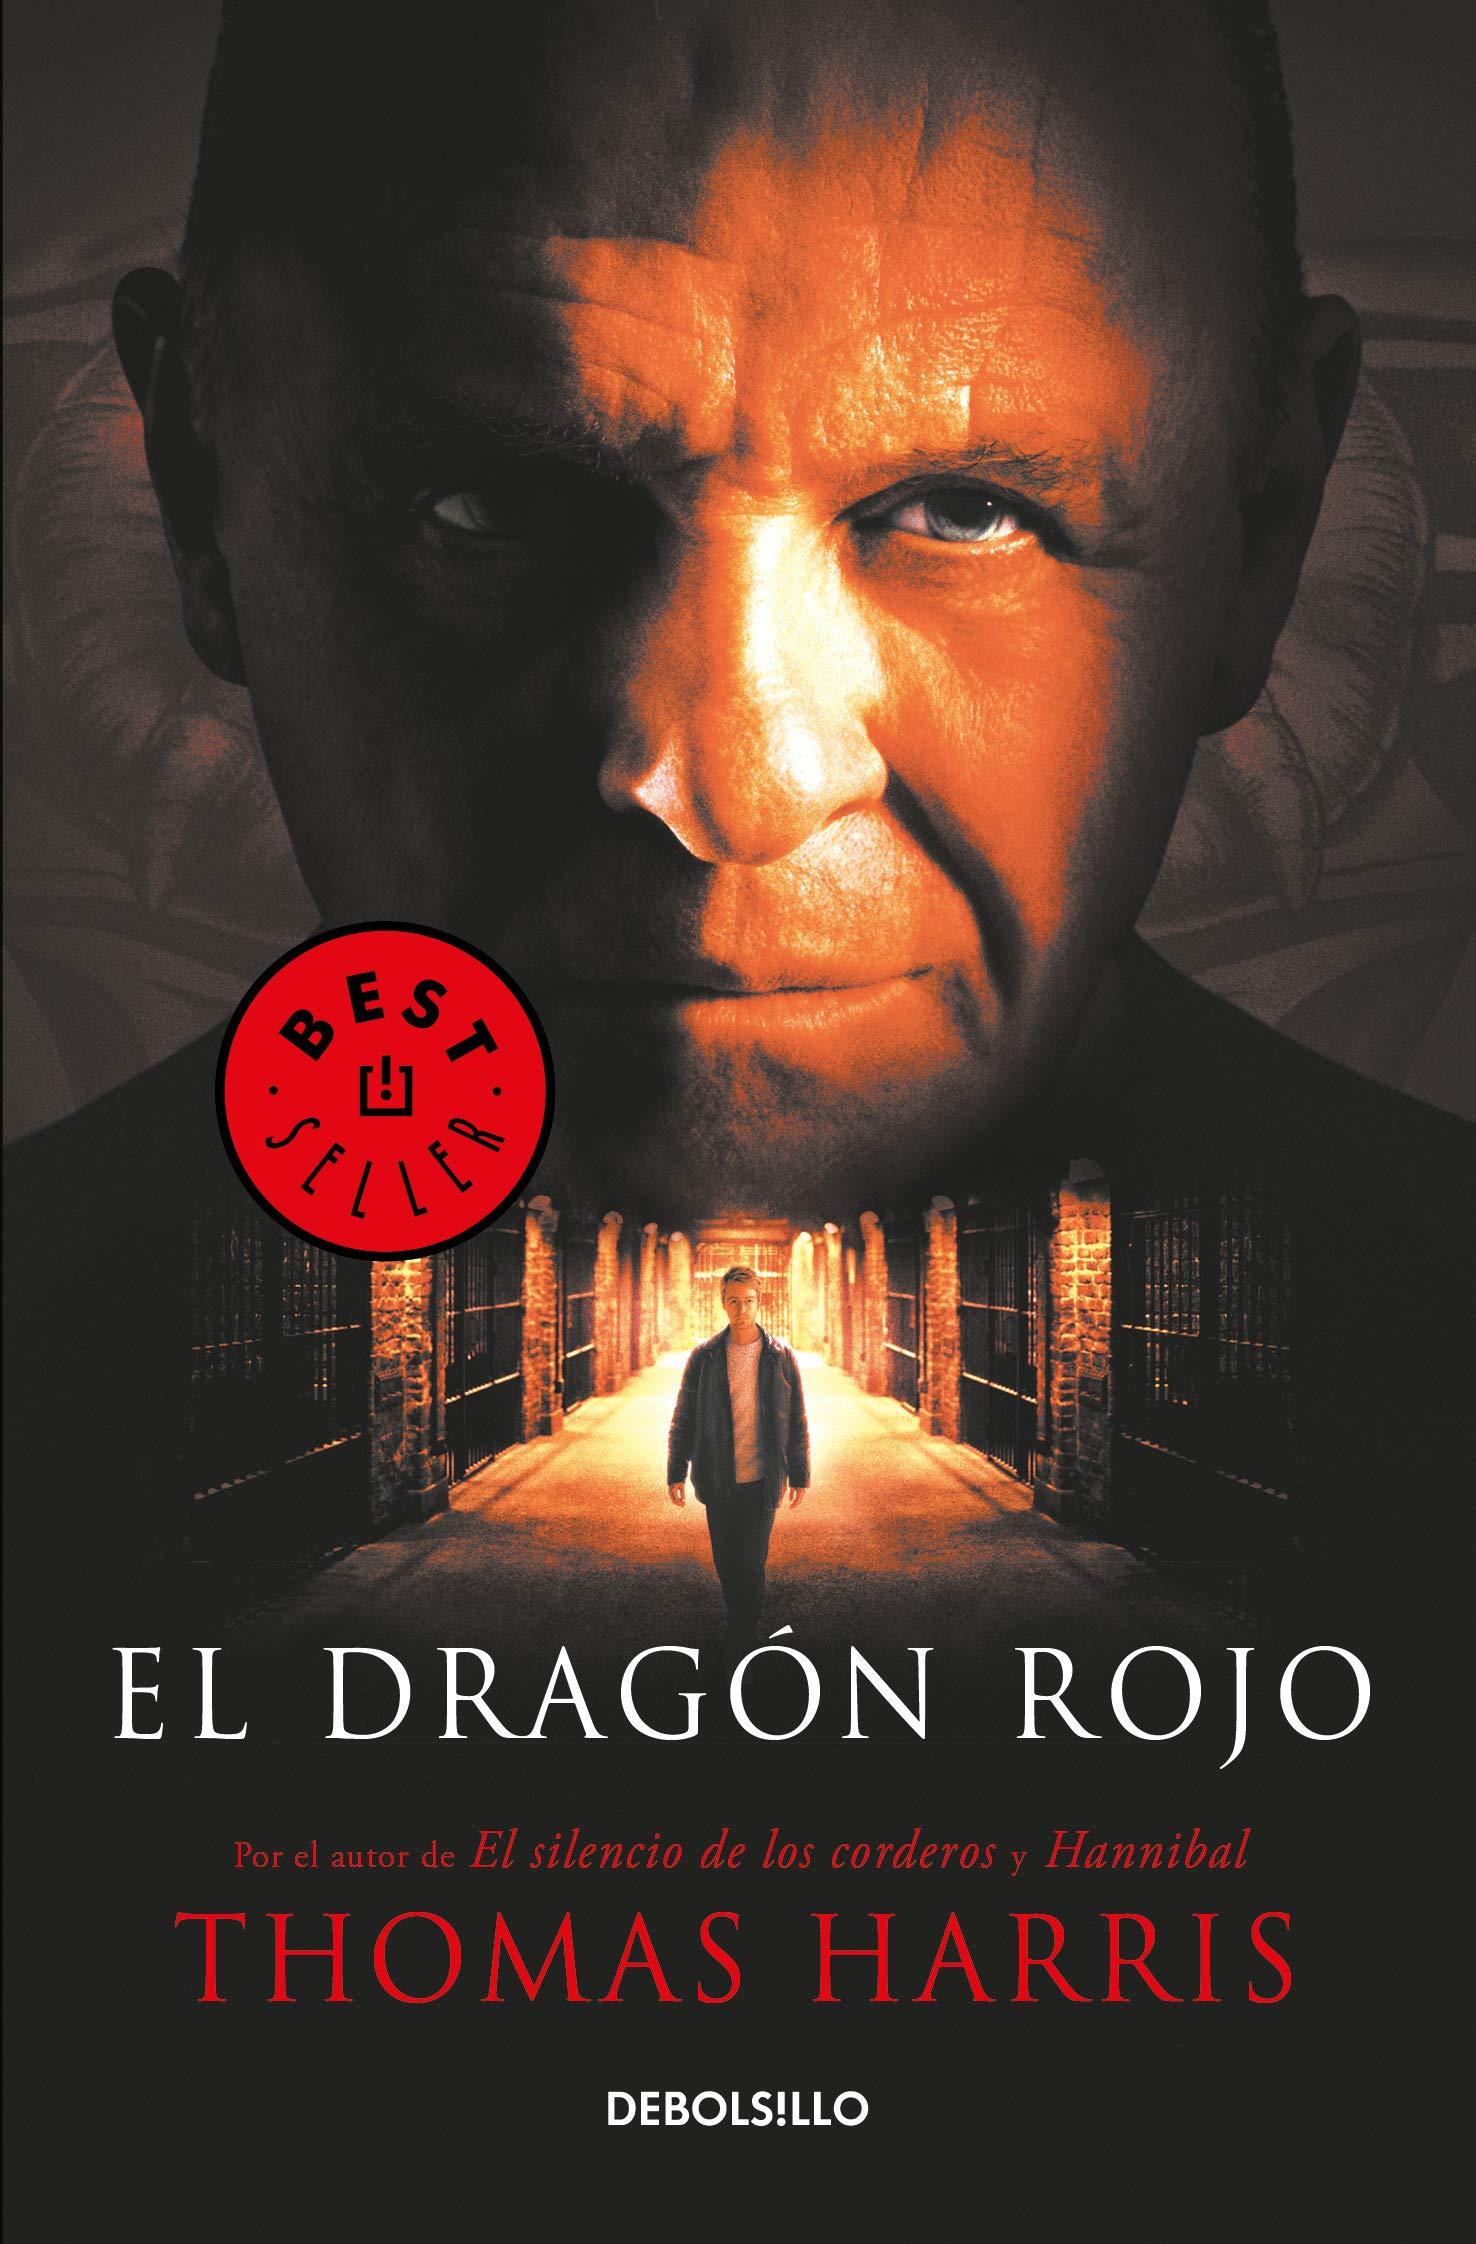 Amazon.com: El dragón rojo / Red Dragon (Spanish Edition) (9786073172738): Thomas Harris: Books